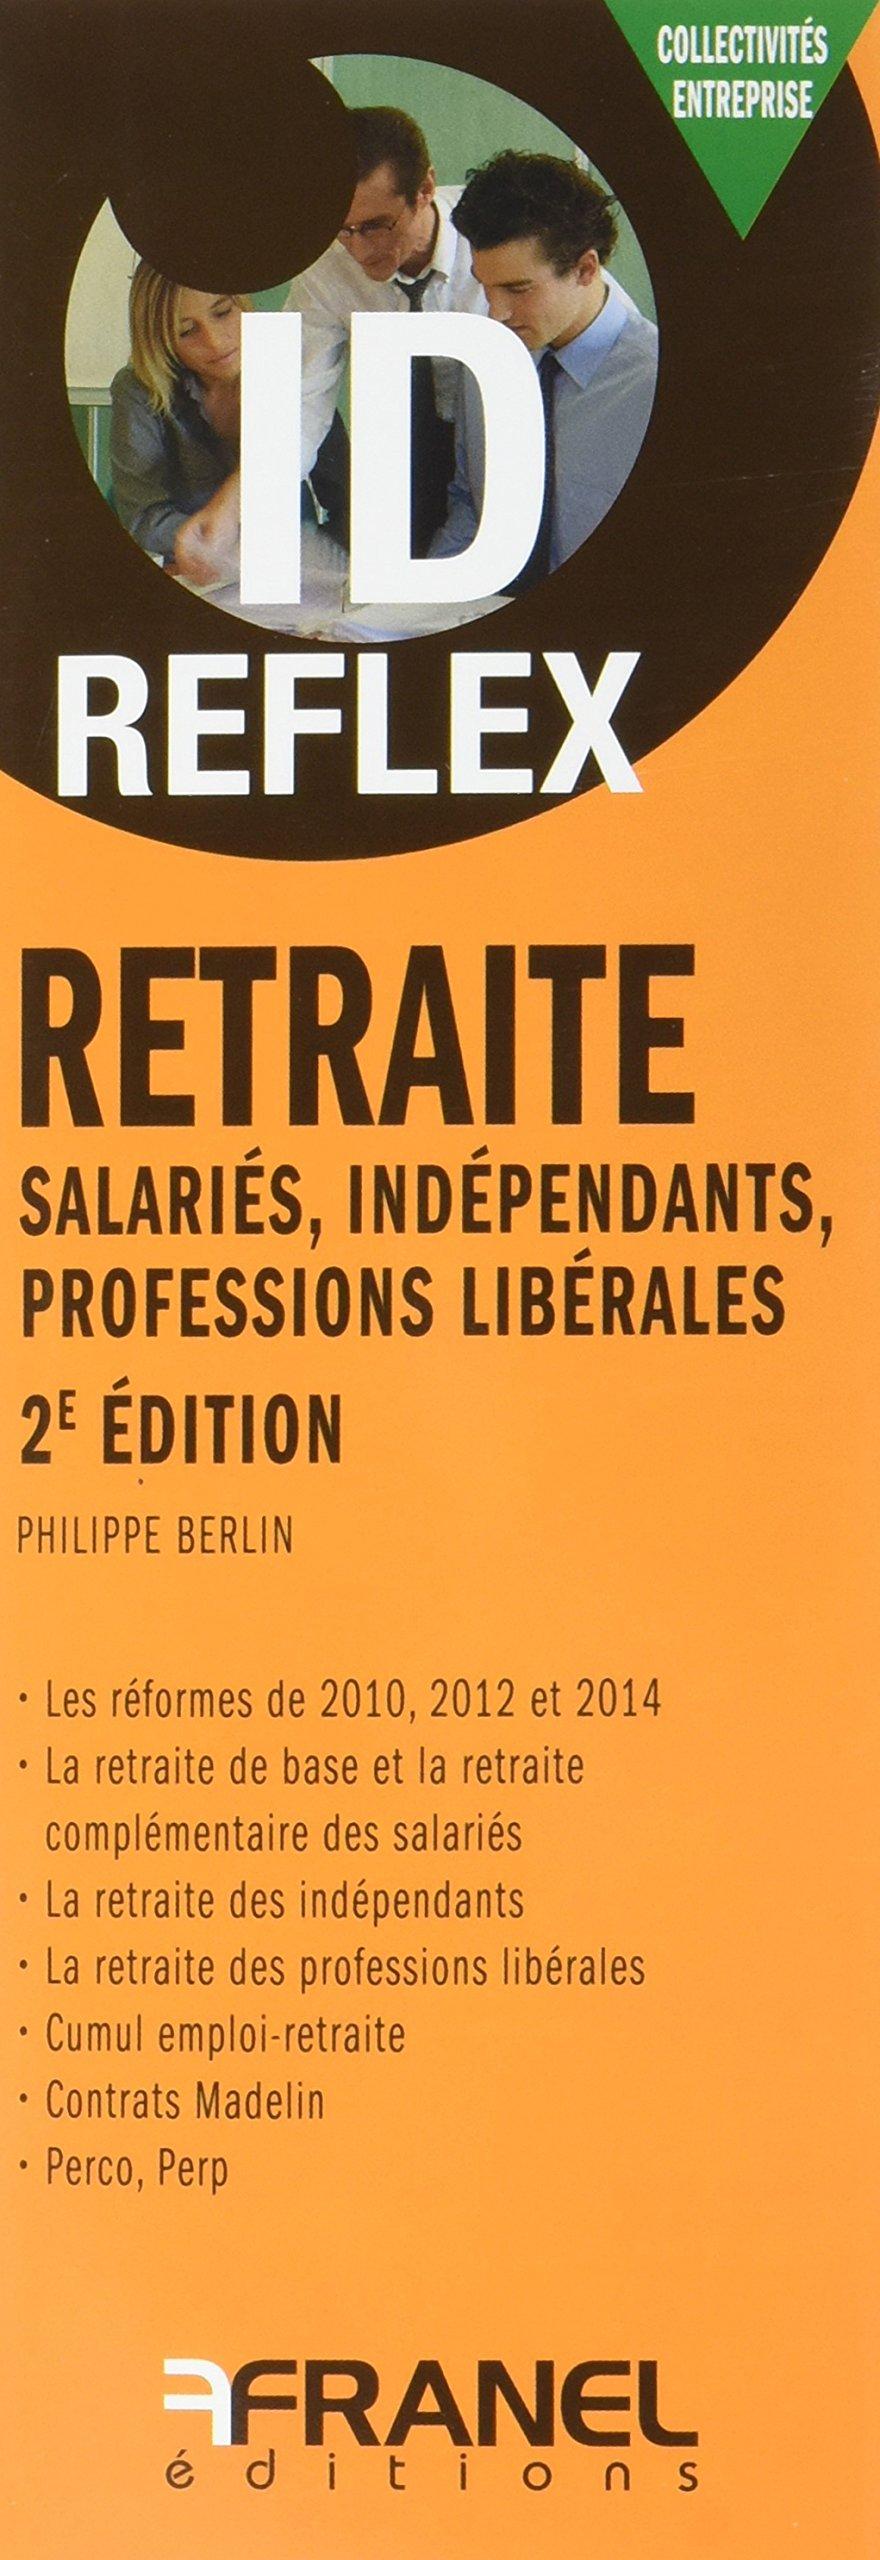 Amazon Fr Id Reflex Retraite Philippe Berlin Livres